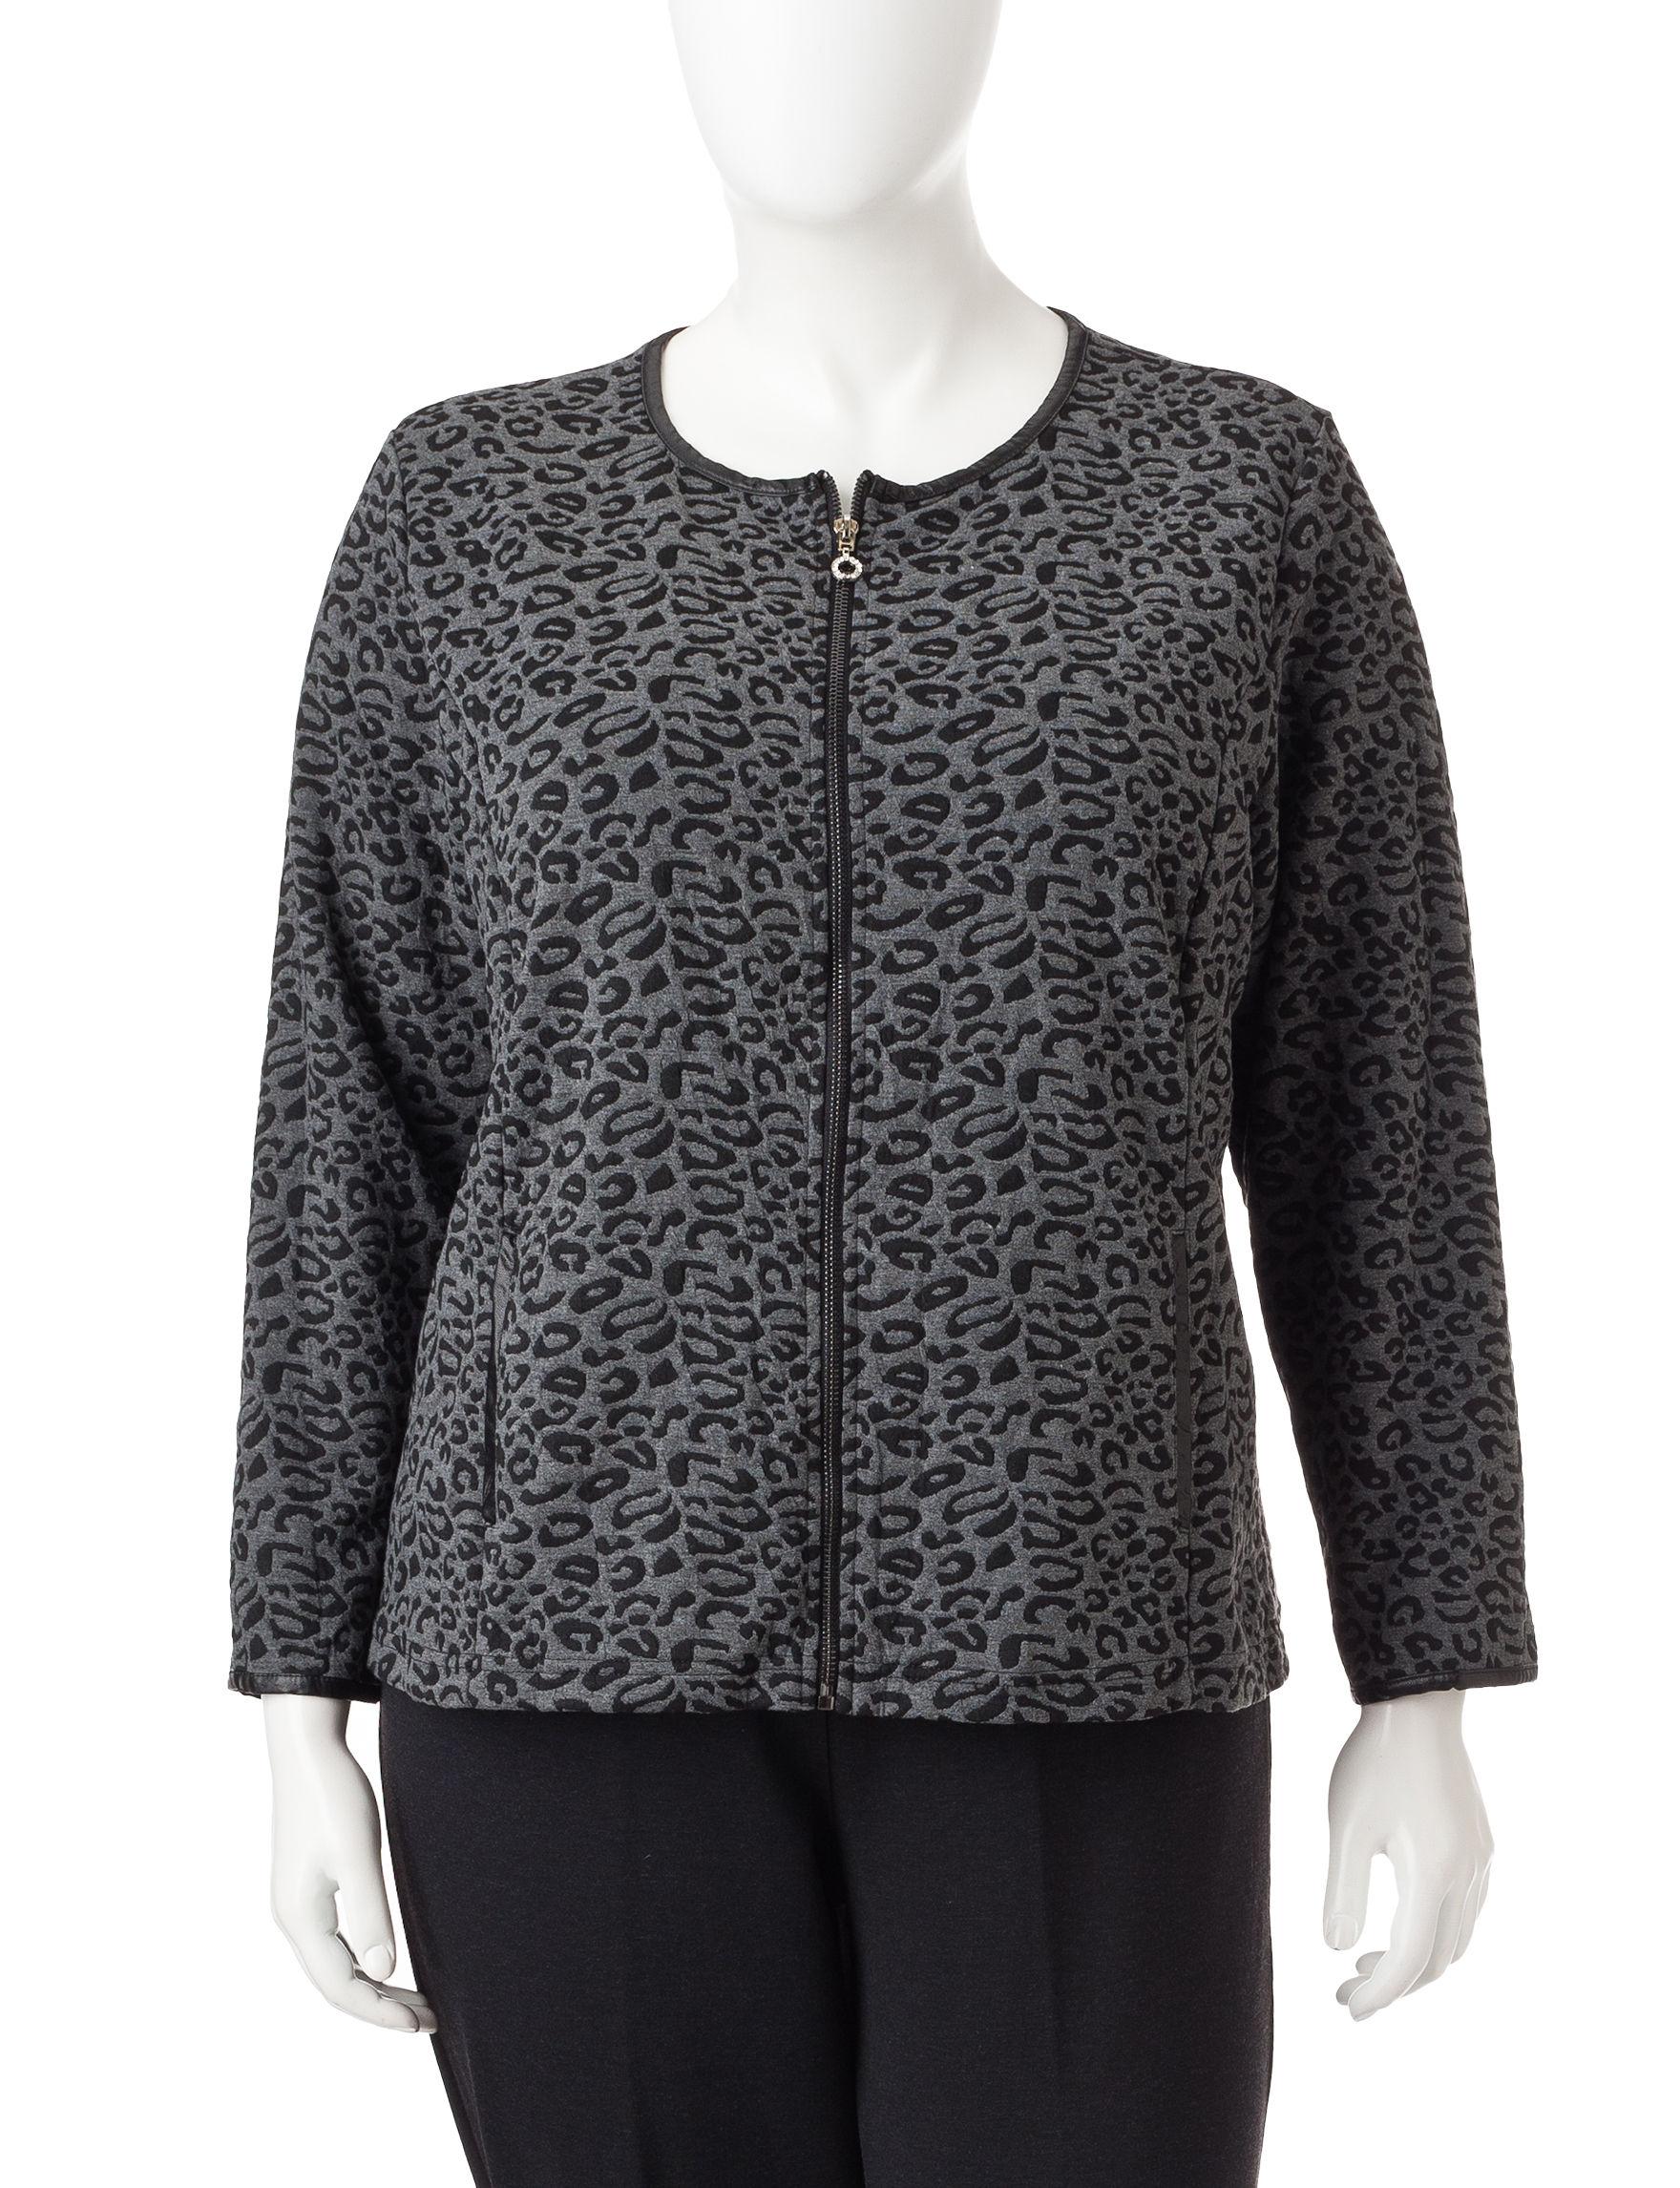 Cathy Daniels Black Cardigans Sweaters